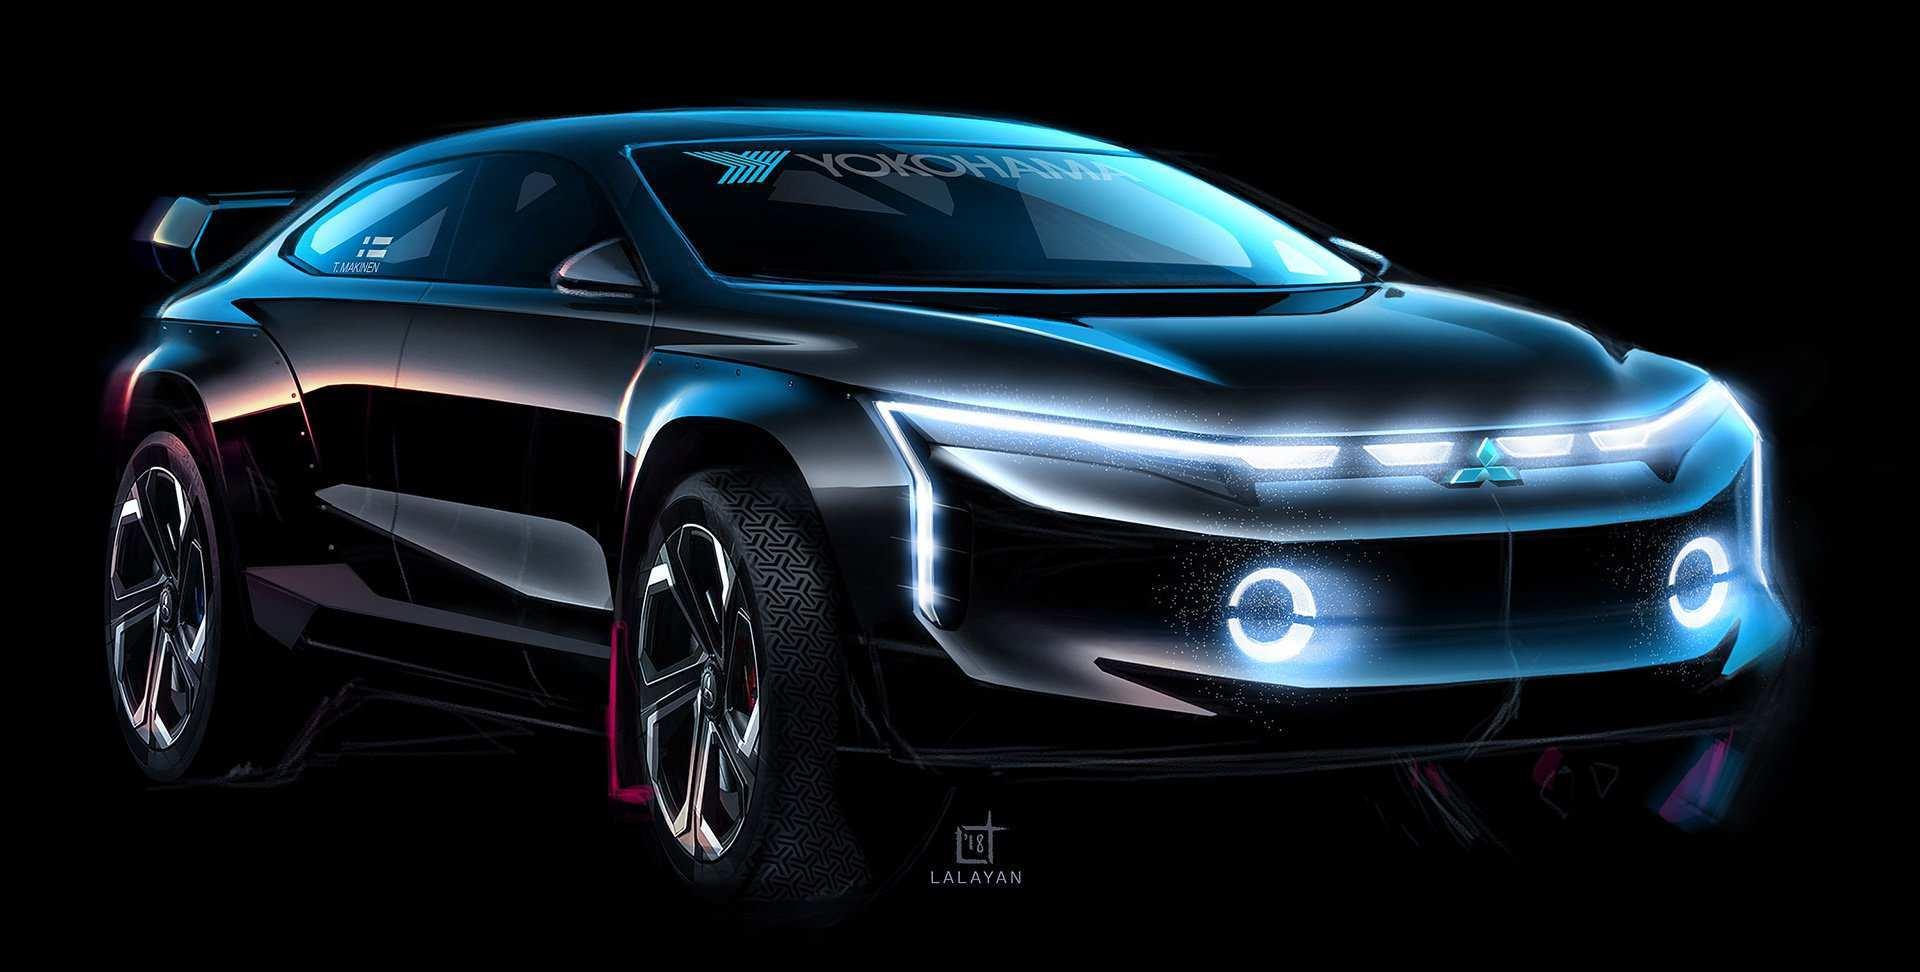 51 All New Mitsubishi Coupe 2020 Ratings with Mitsubishi Coupe 2020